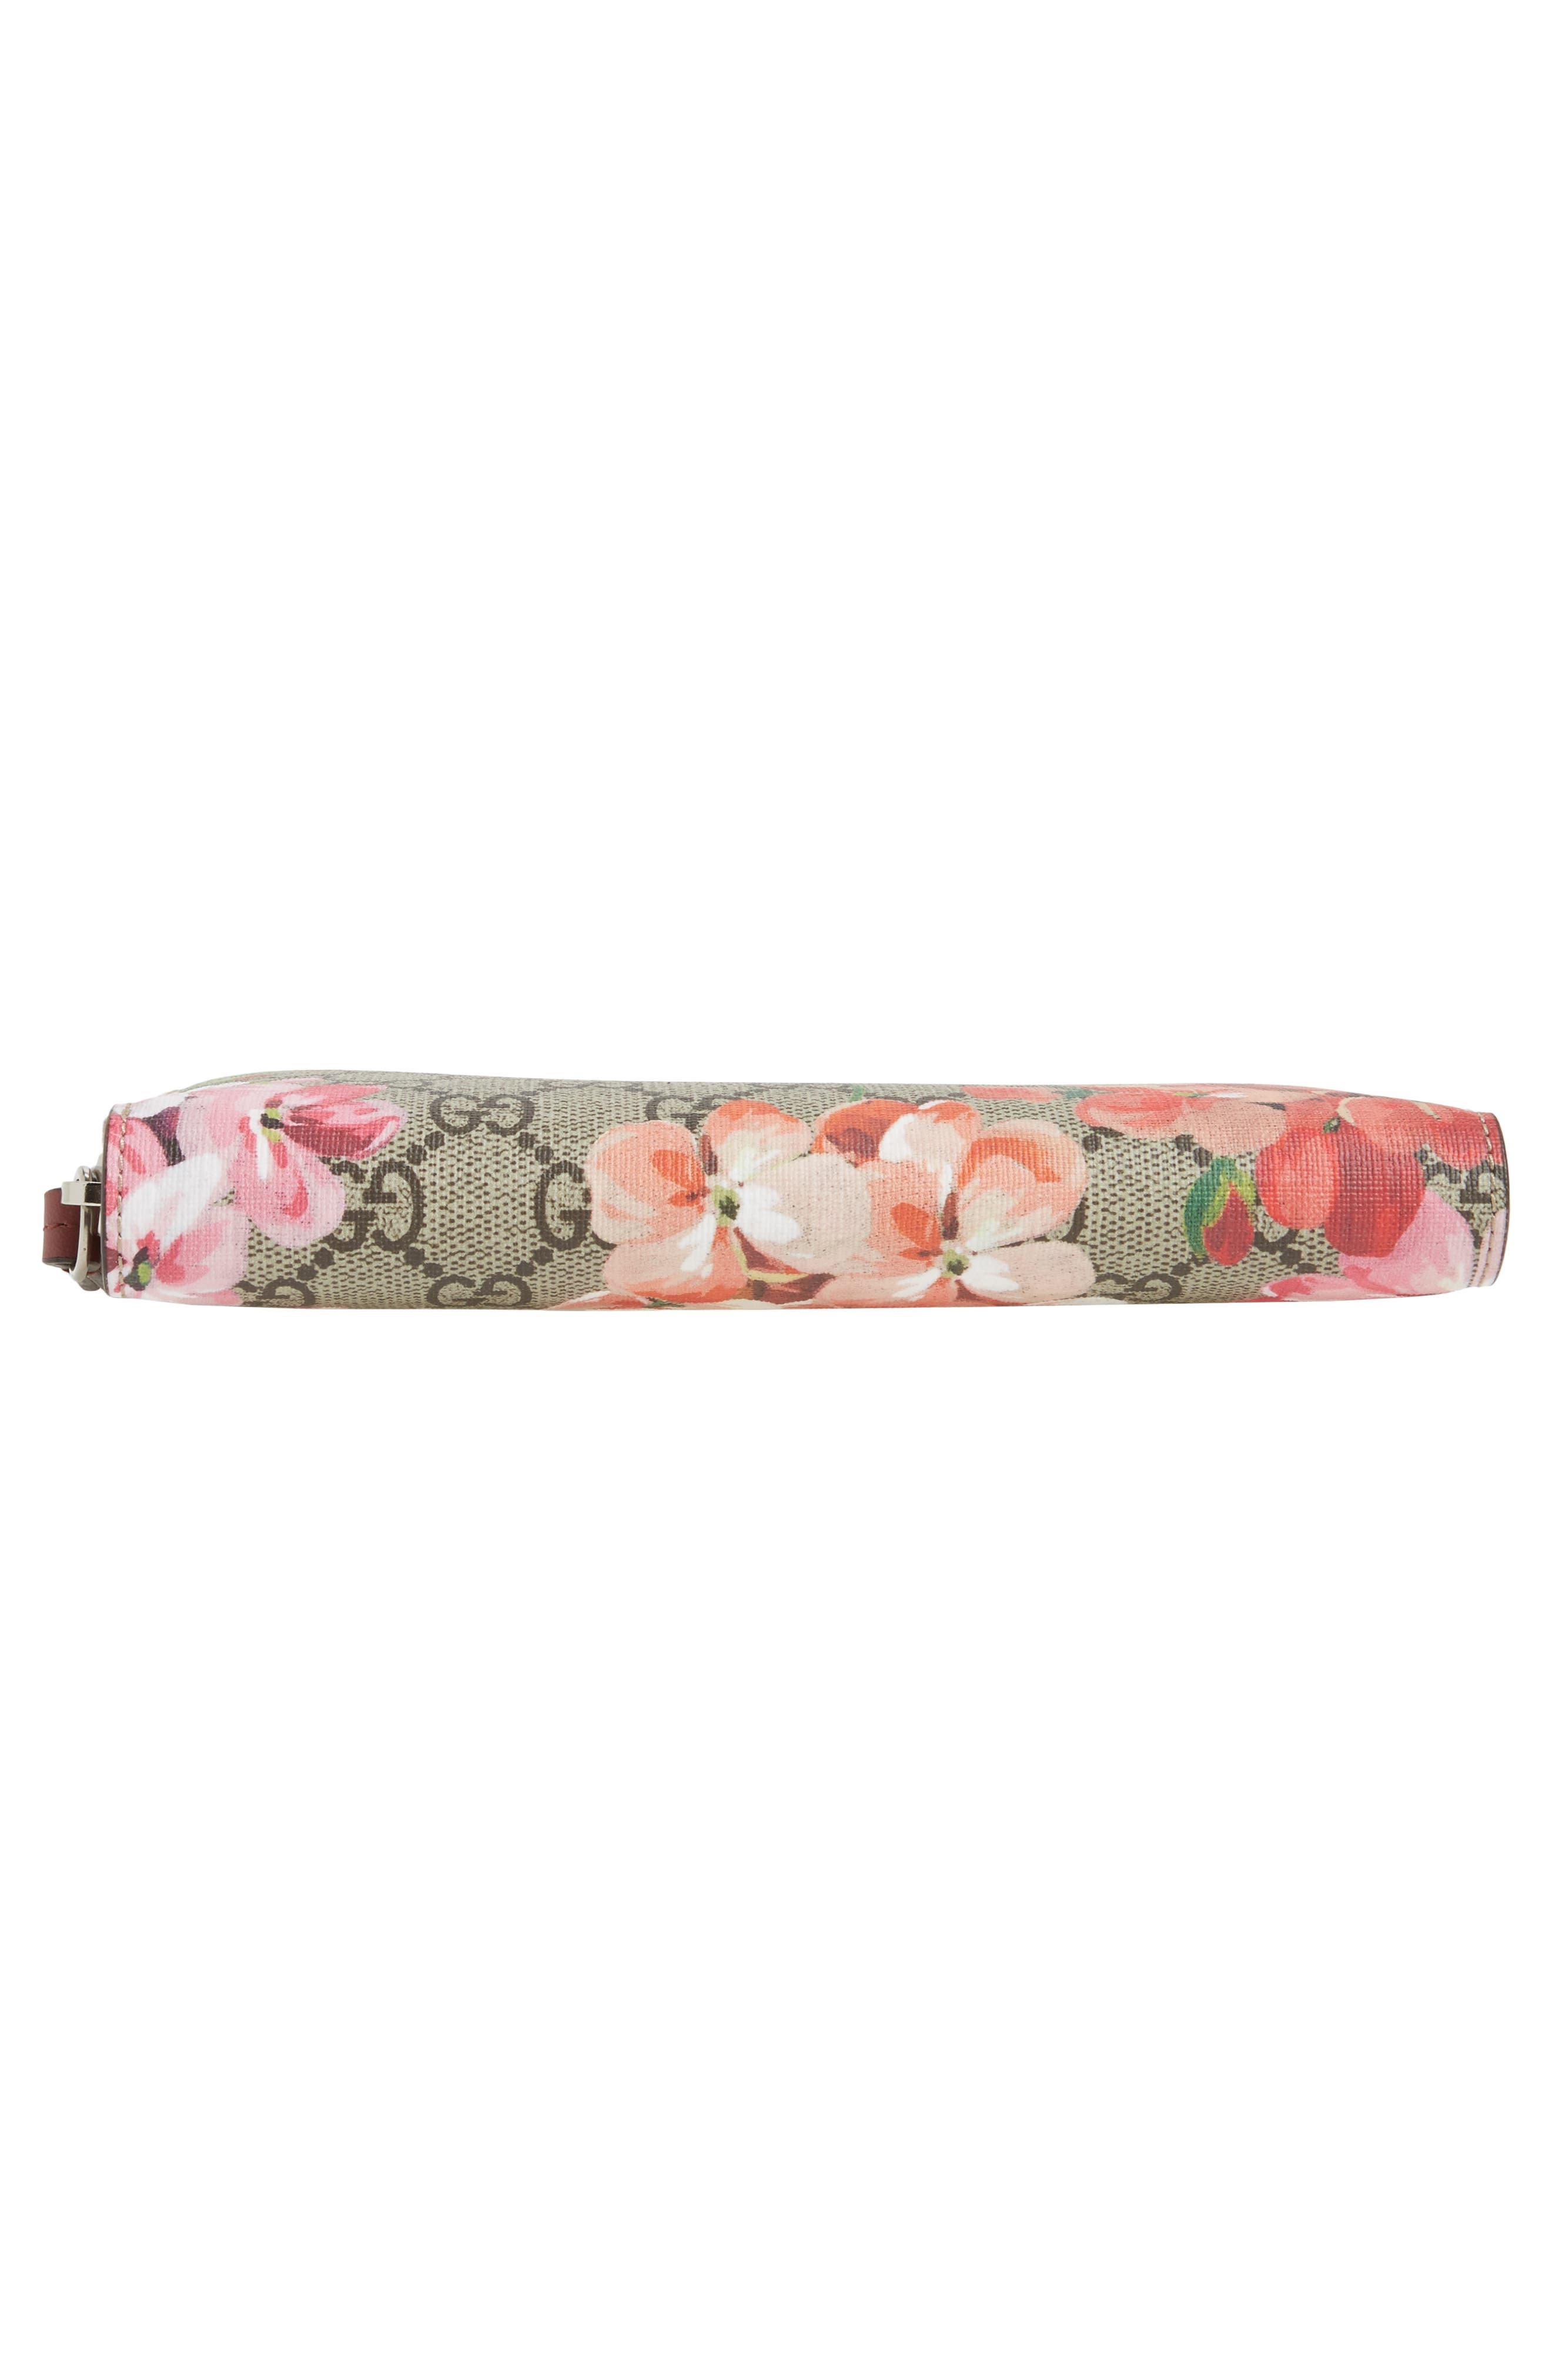 GG Blooms Zip Around Wallet,                             Alternate thumbnail 6, color,                             Beige Ebony Multi/ Dry Rose